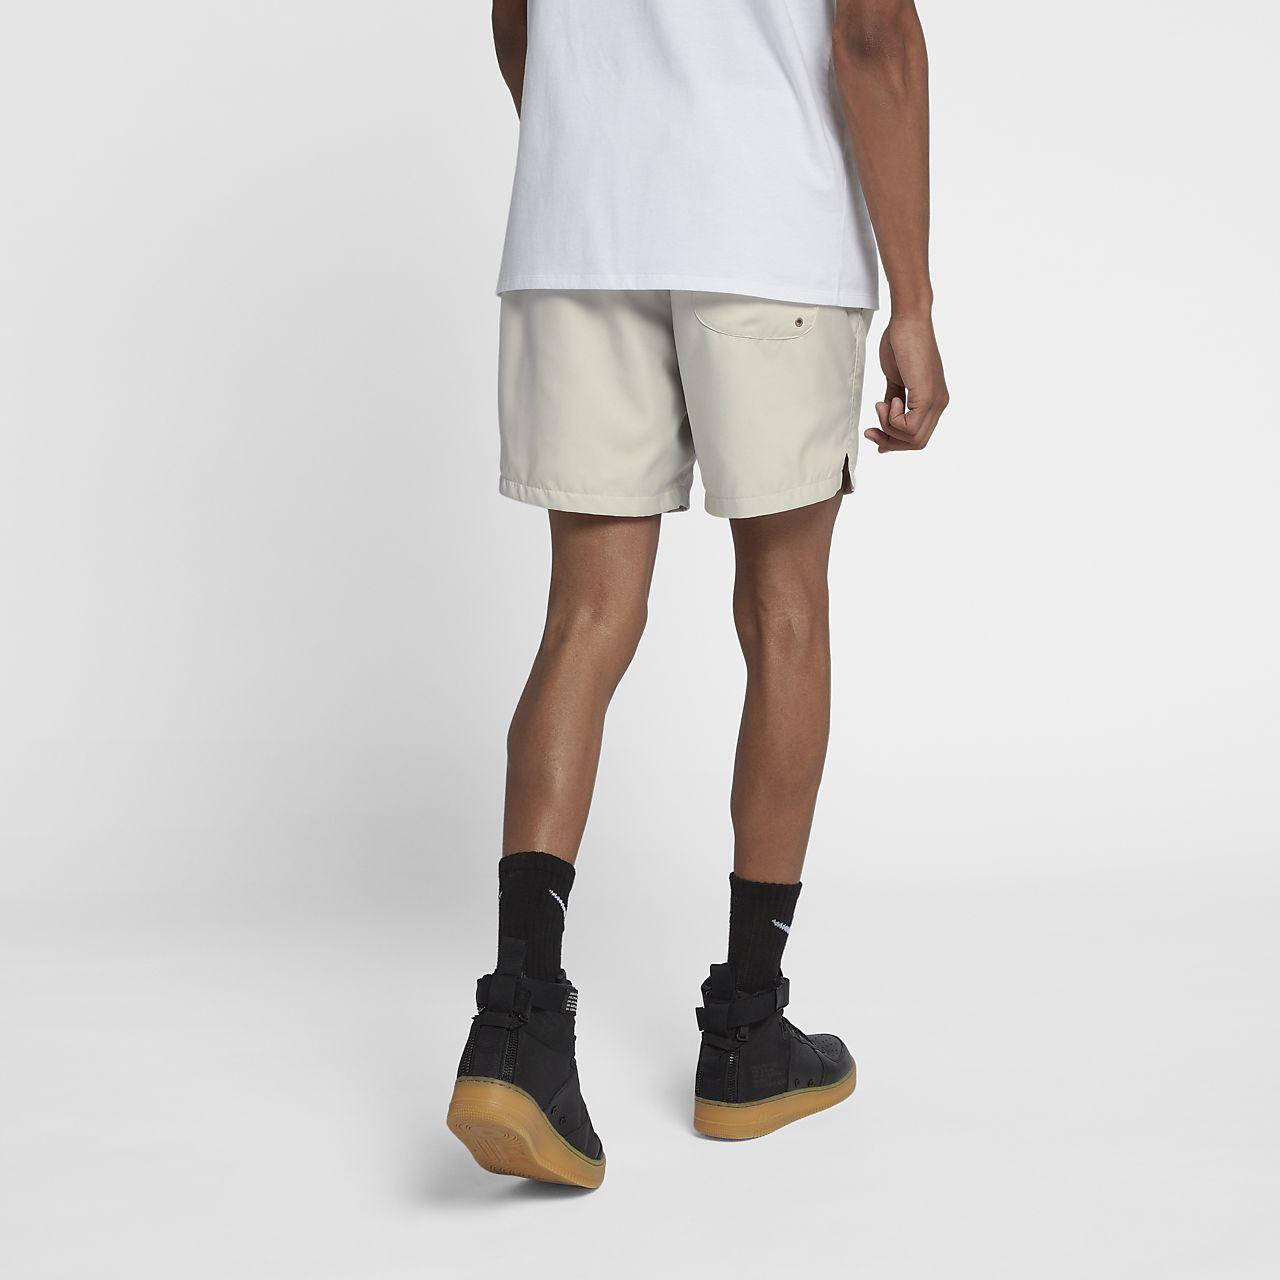 ... Short tissé Nike Sportswear pour Homme